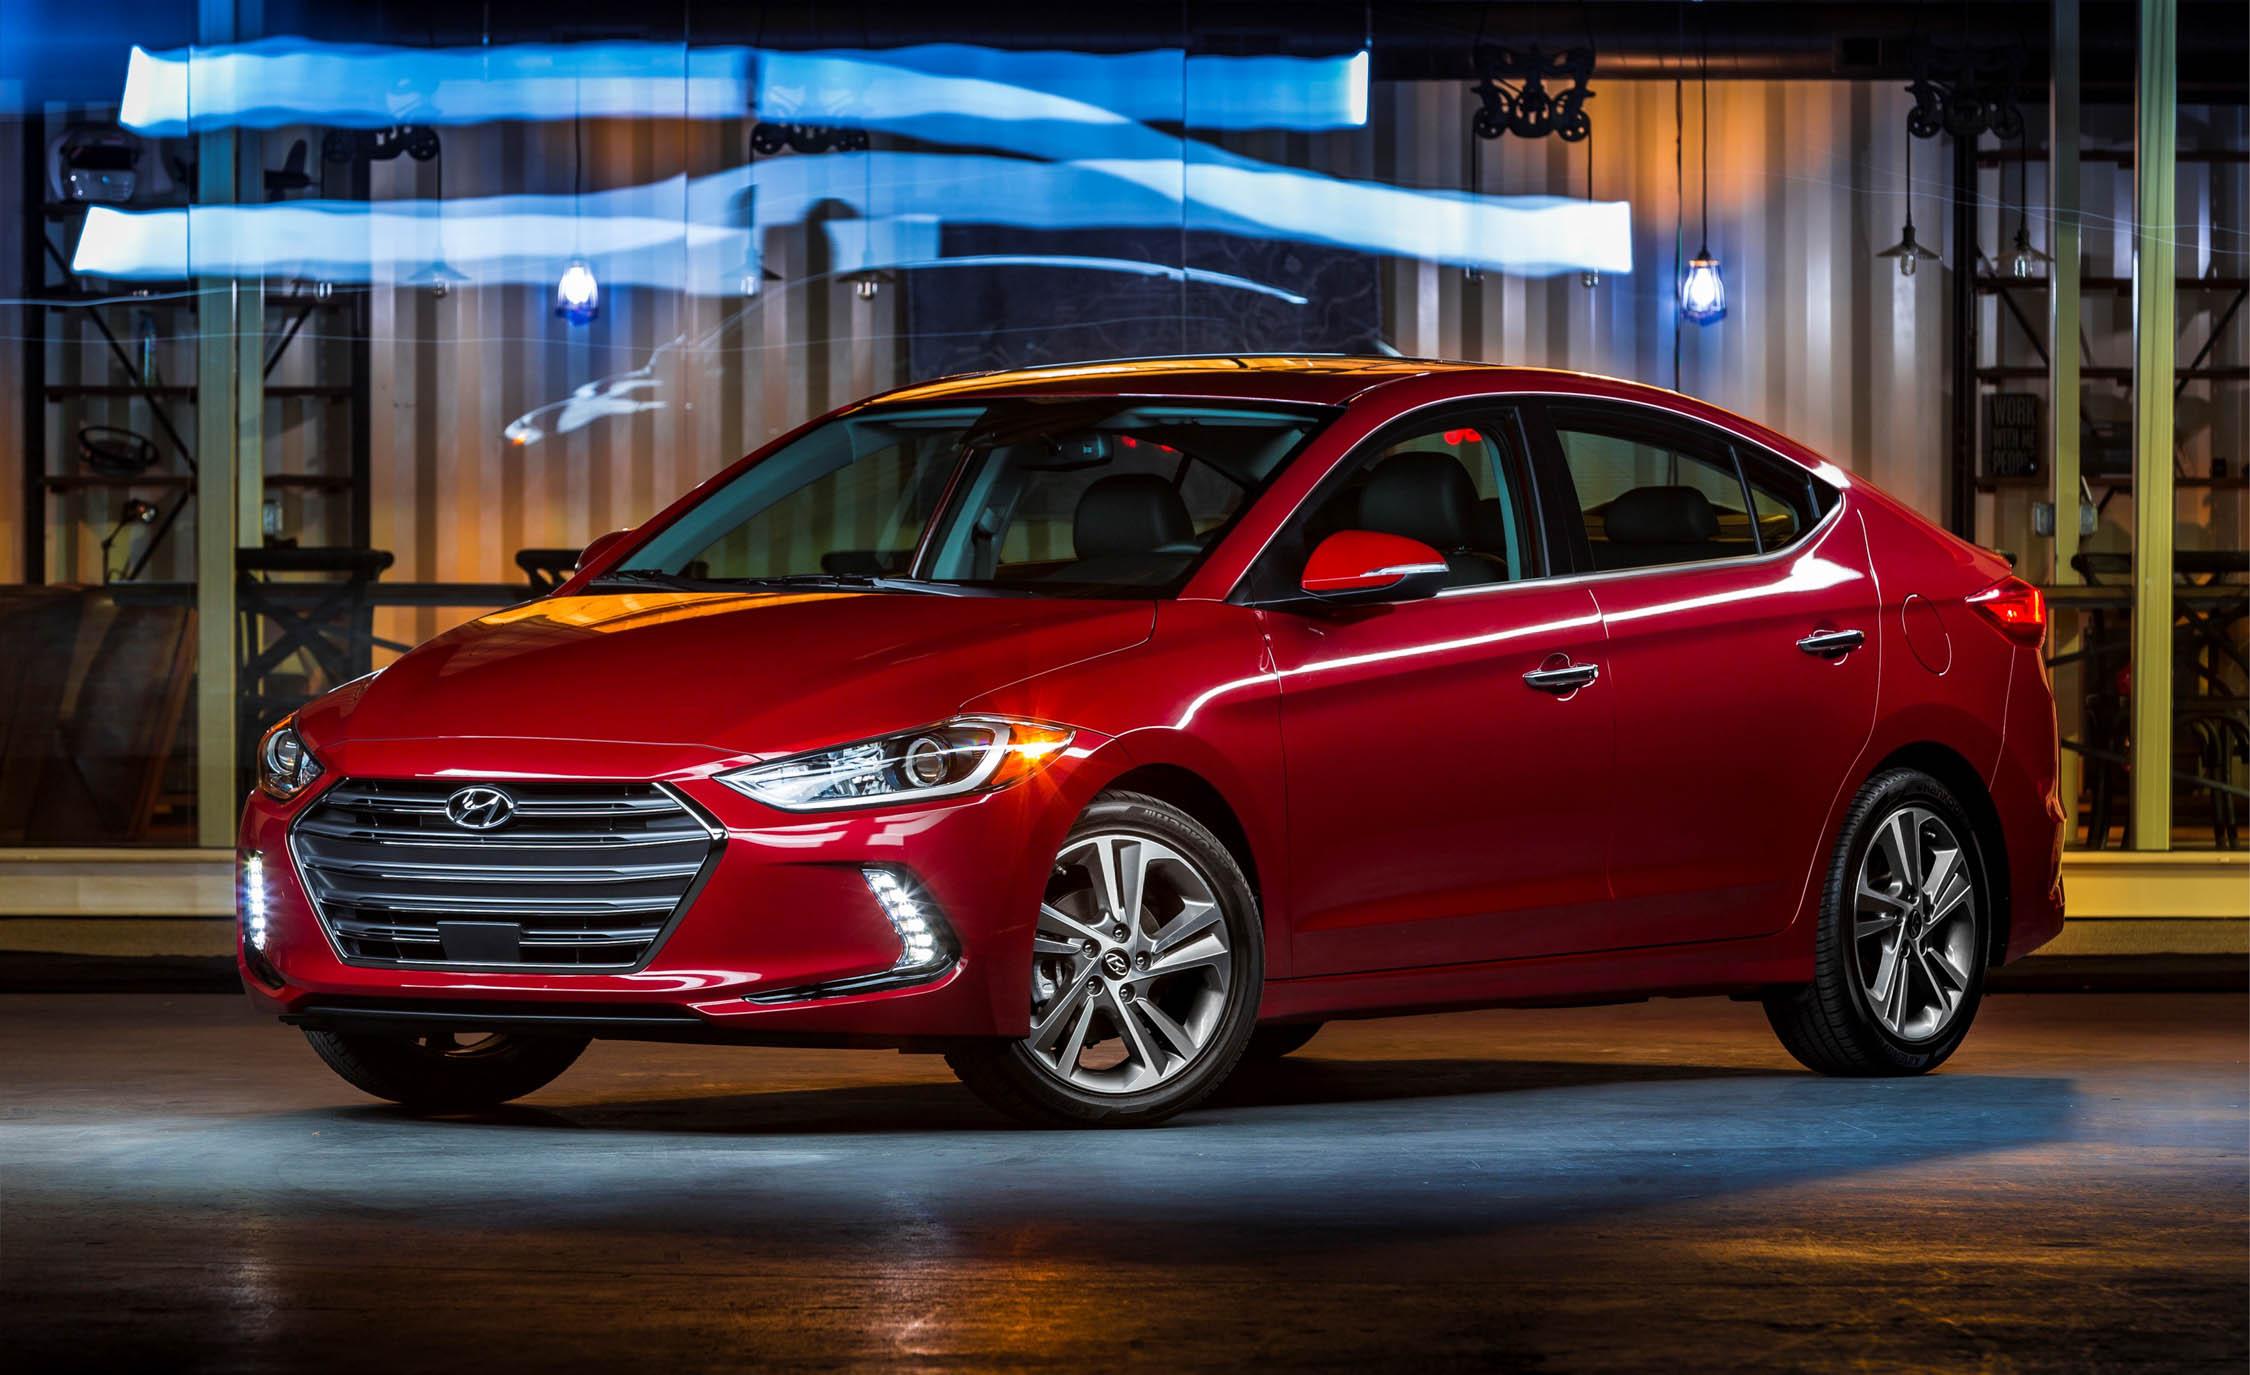 New-Hyundai-Elantra-2017